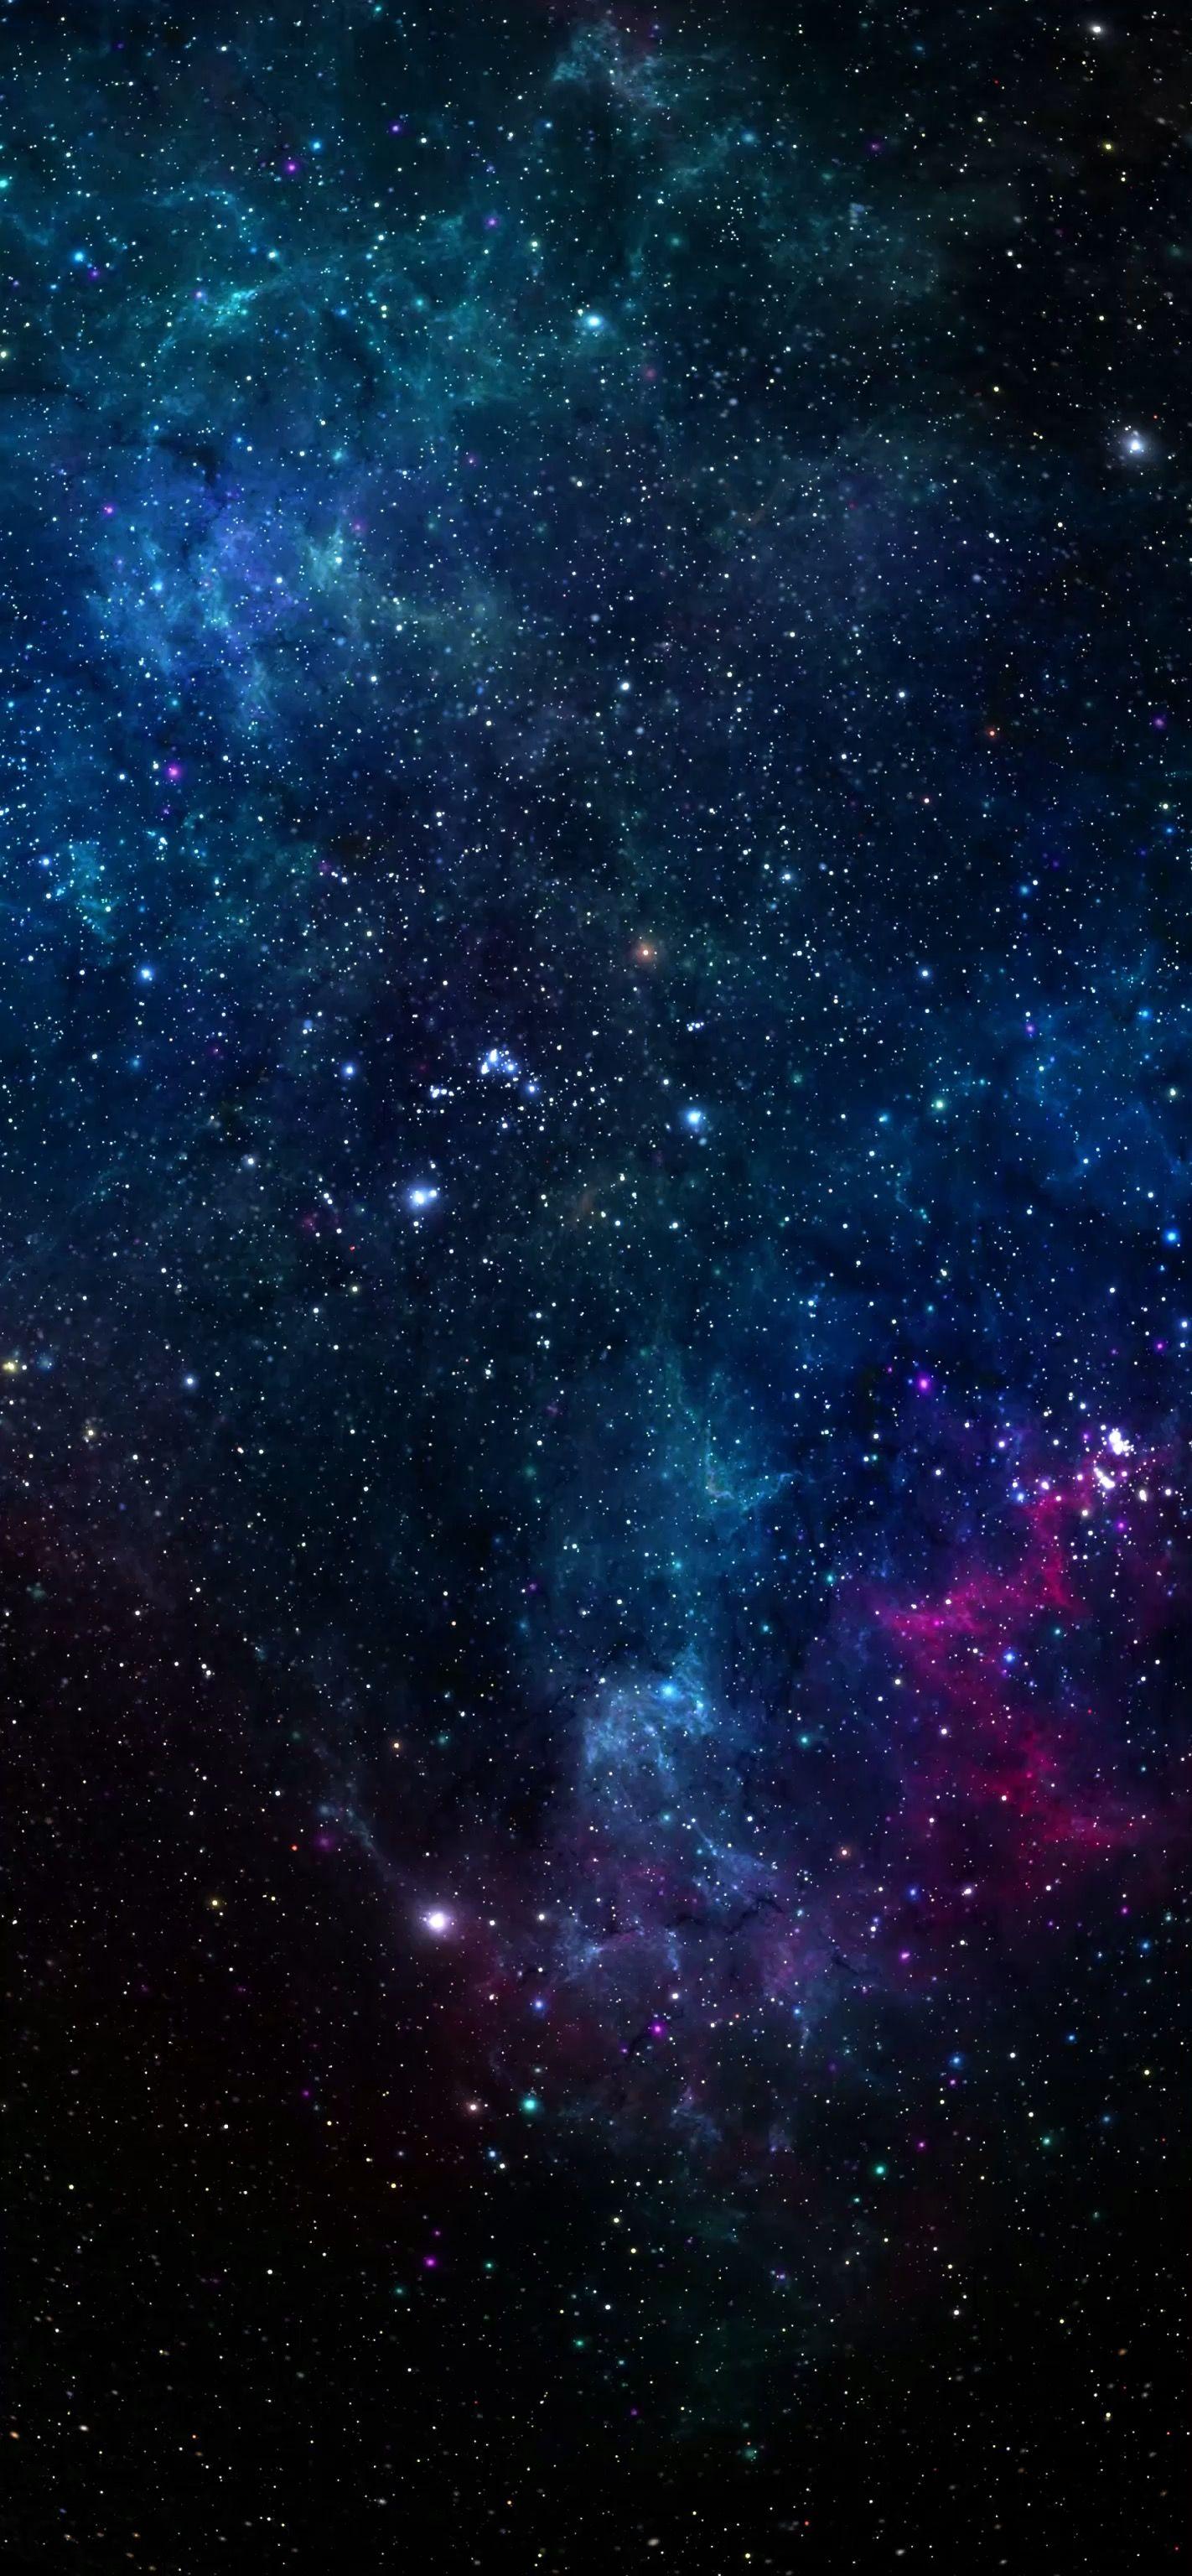 Interstellar Live Wallpaper Wallpapers Central In 2021 Galaxy Phone Wallpaper Space Phone Wallpaper Blue Galaxy Wallpaper Galaxy wallpaper live photo